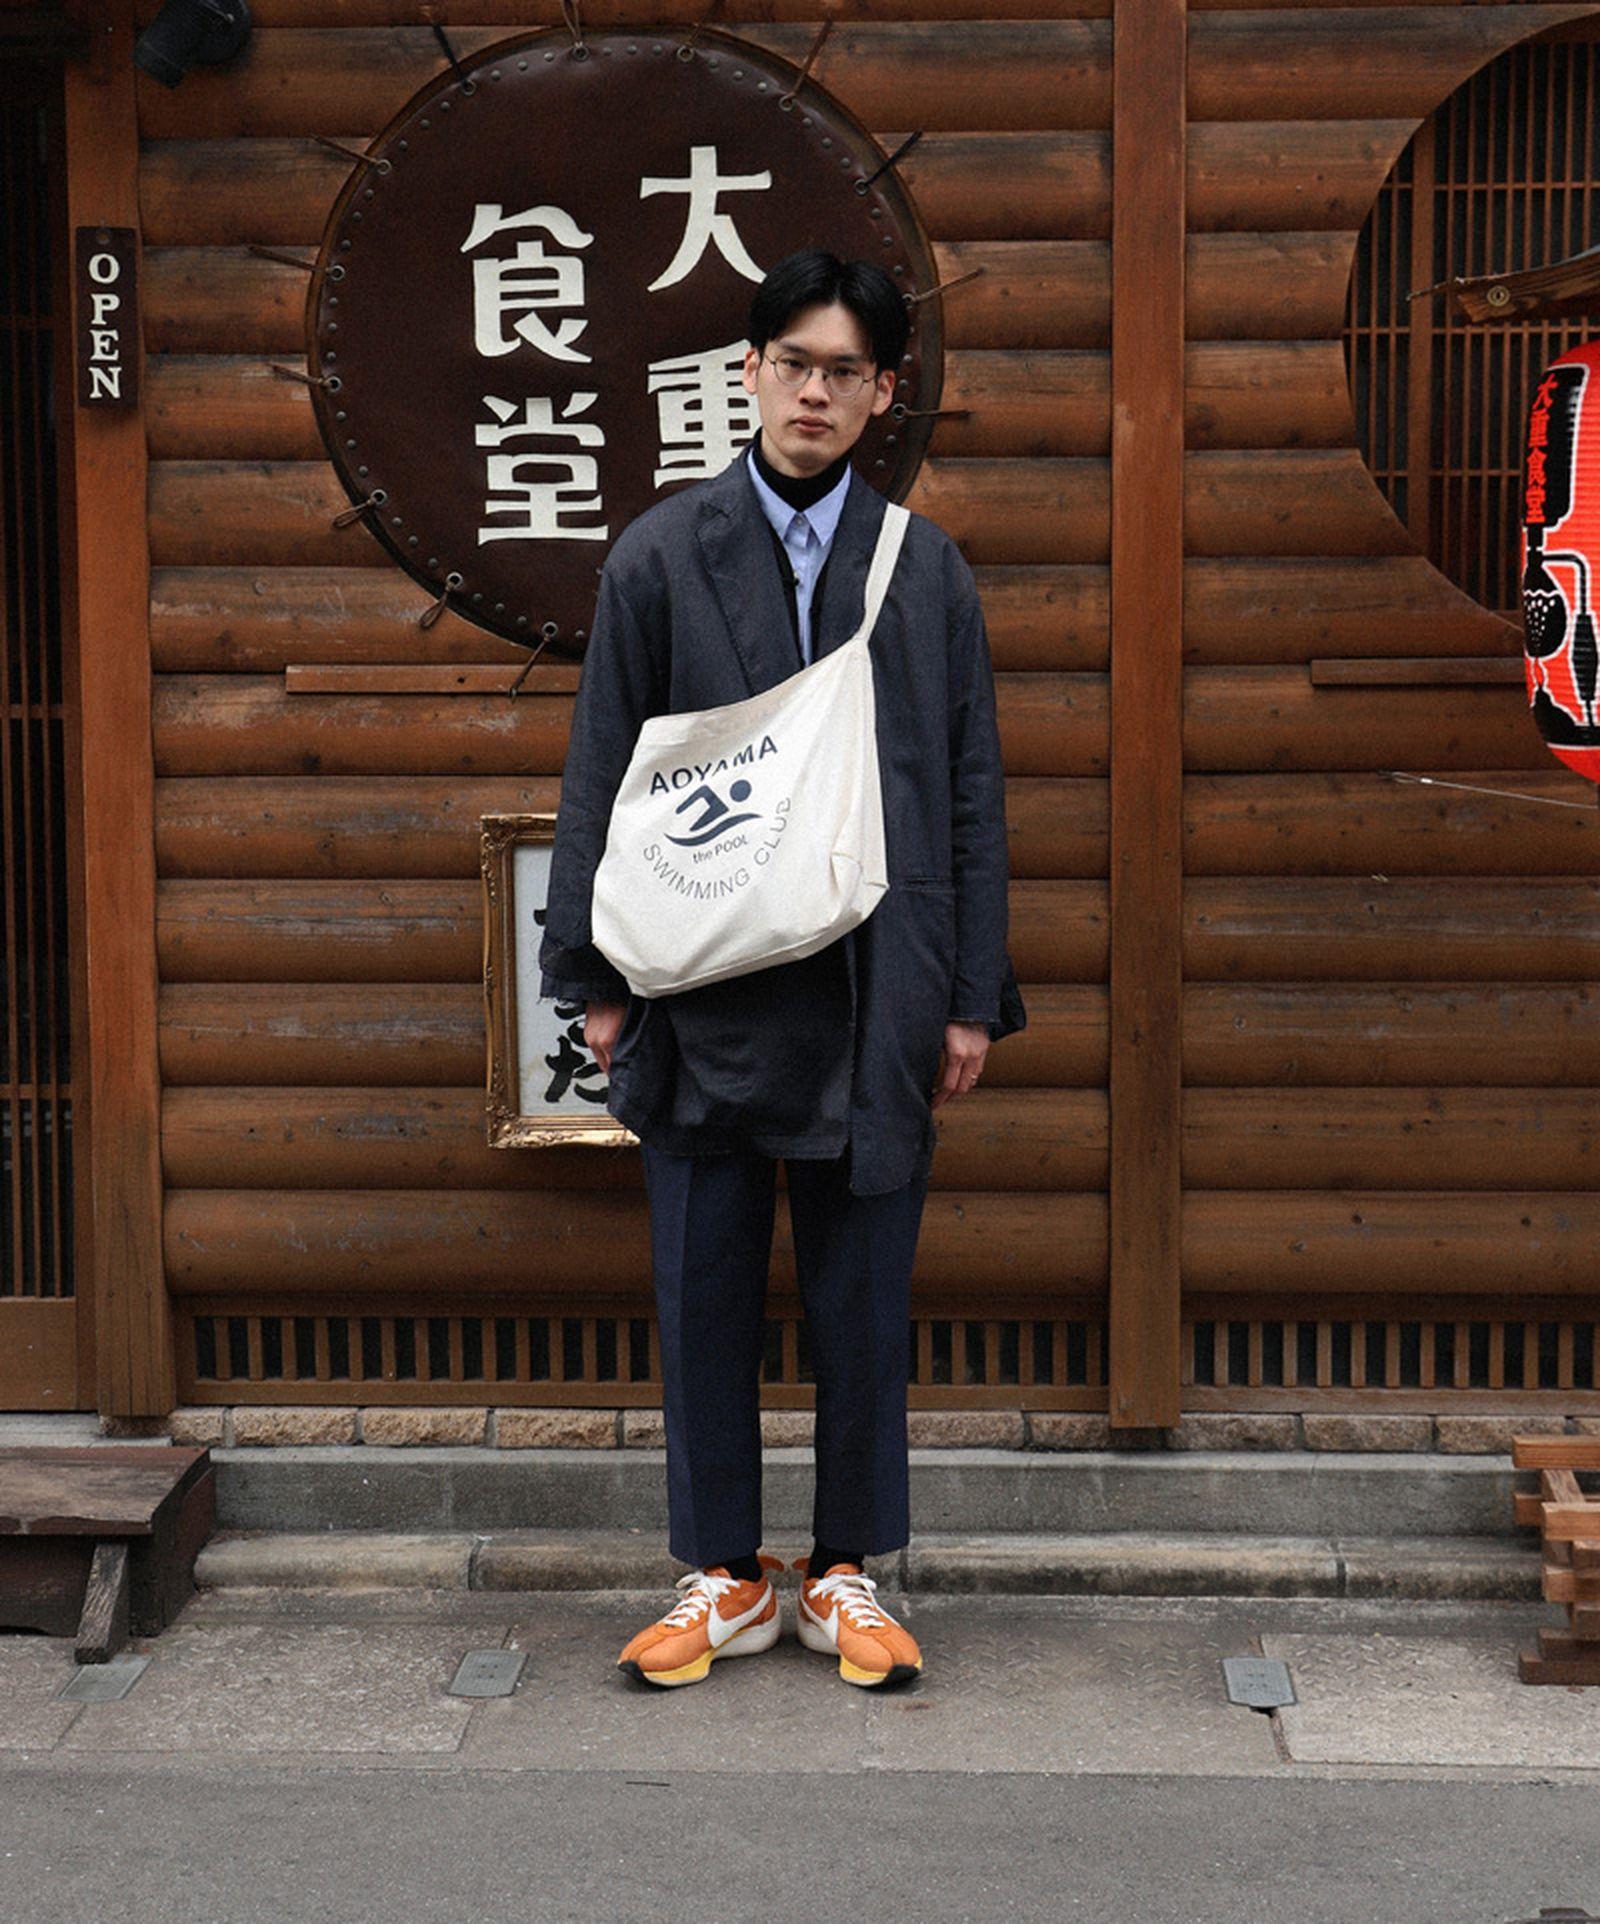 4tokyo street style march 2019 Nicolas Chalmeau